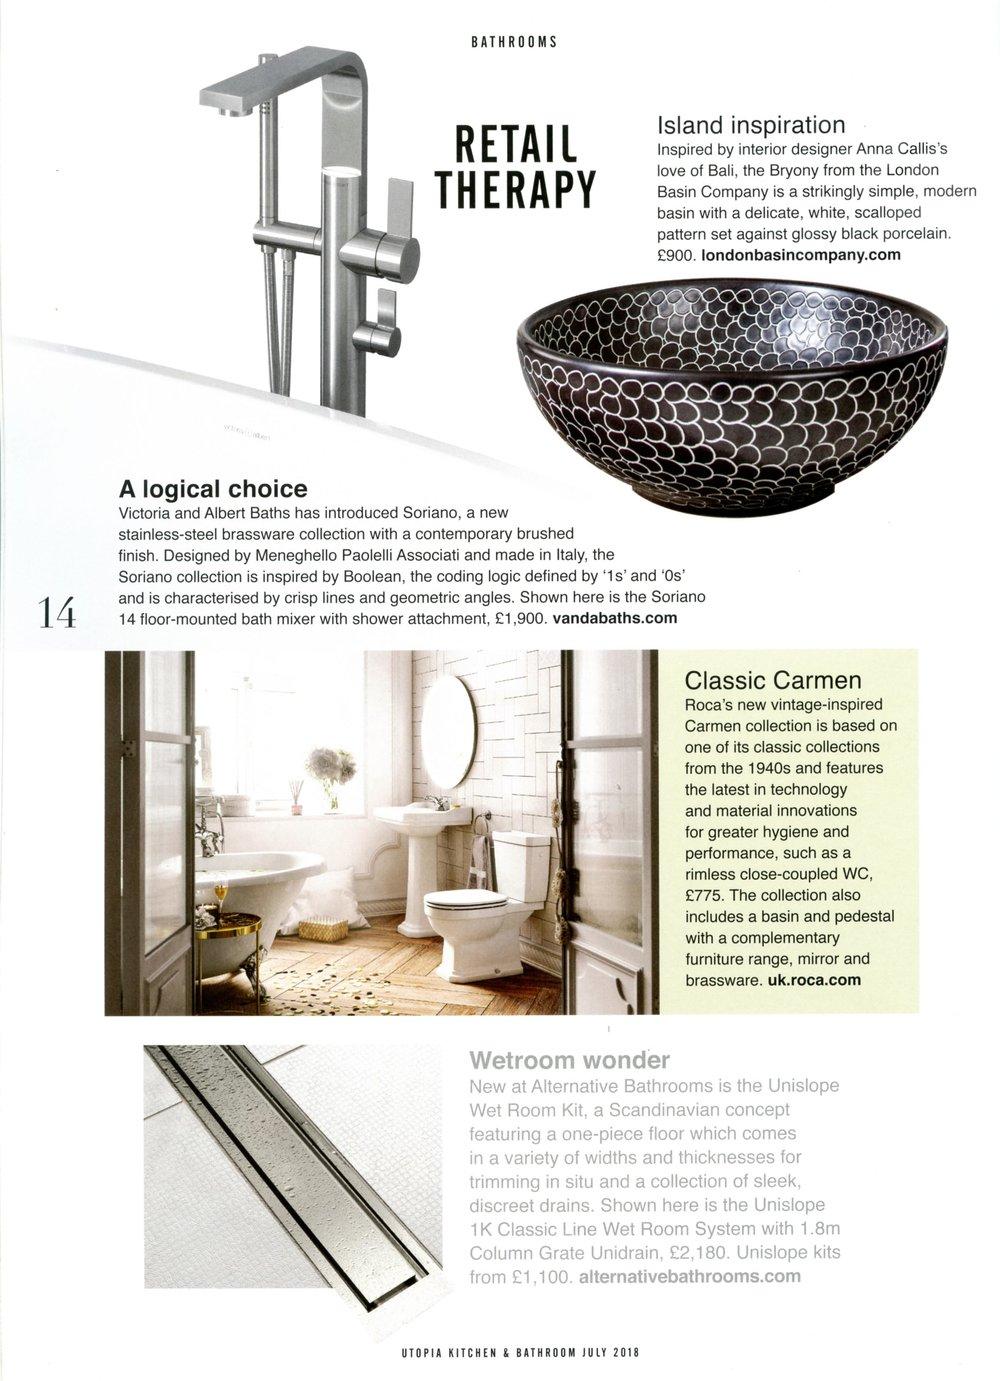 Utopia Kitchen & Bathroom July 2018 LBC.jpg